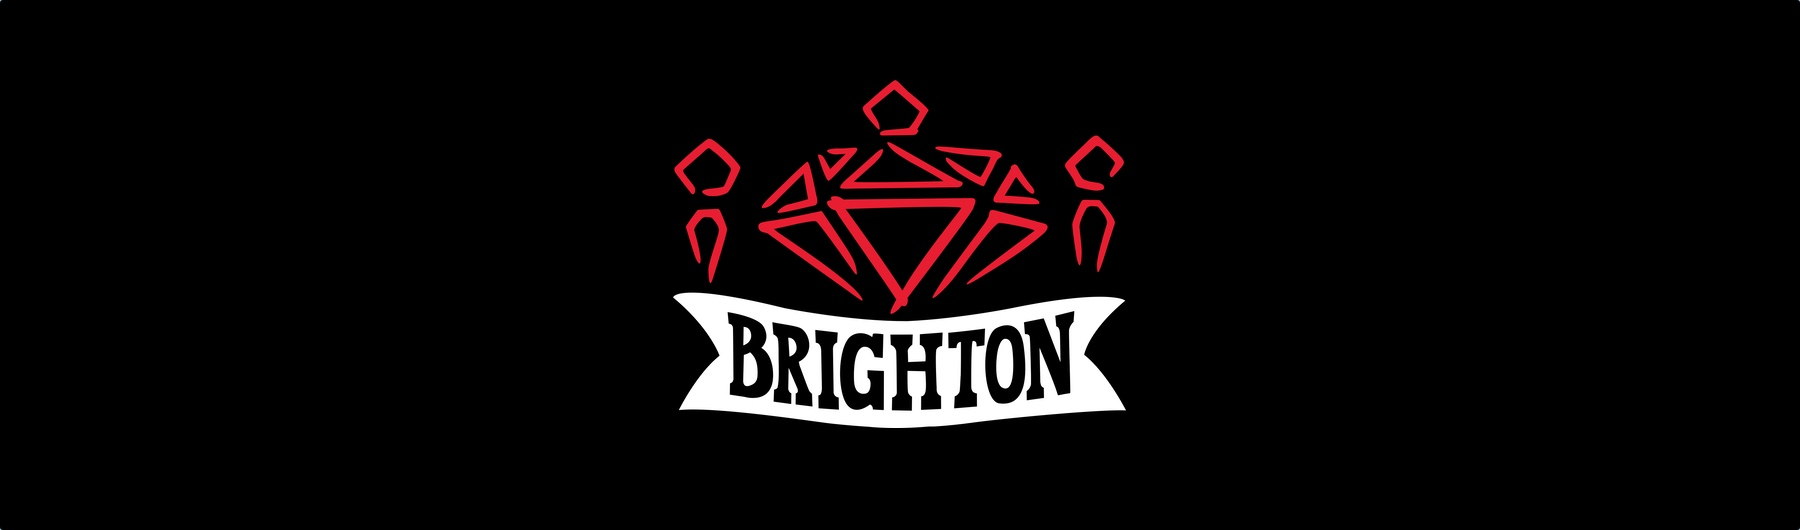 Brighton Ruby 2020